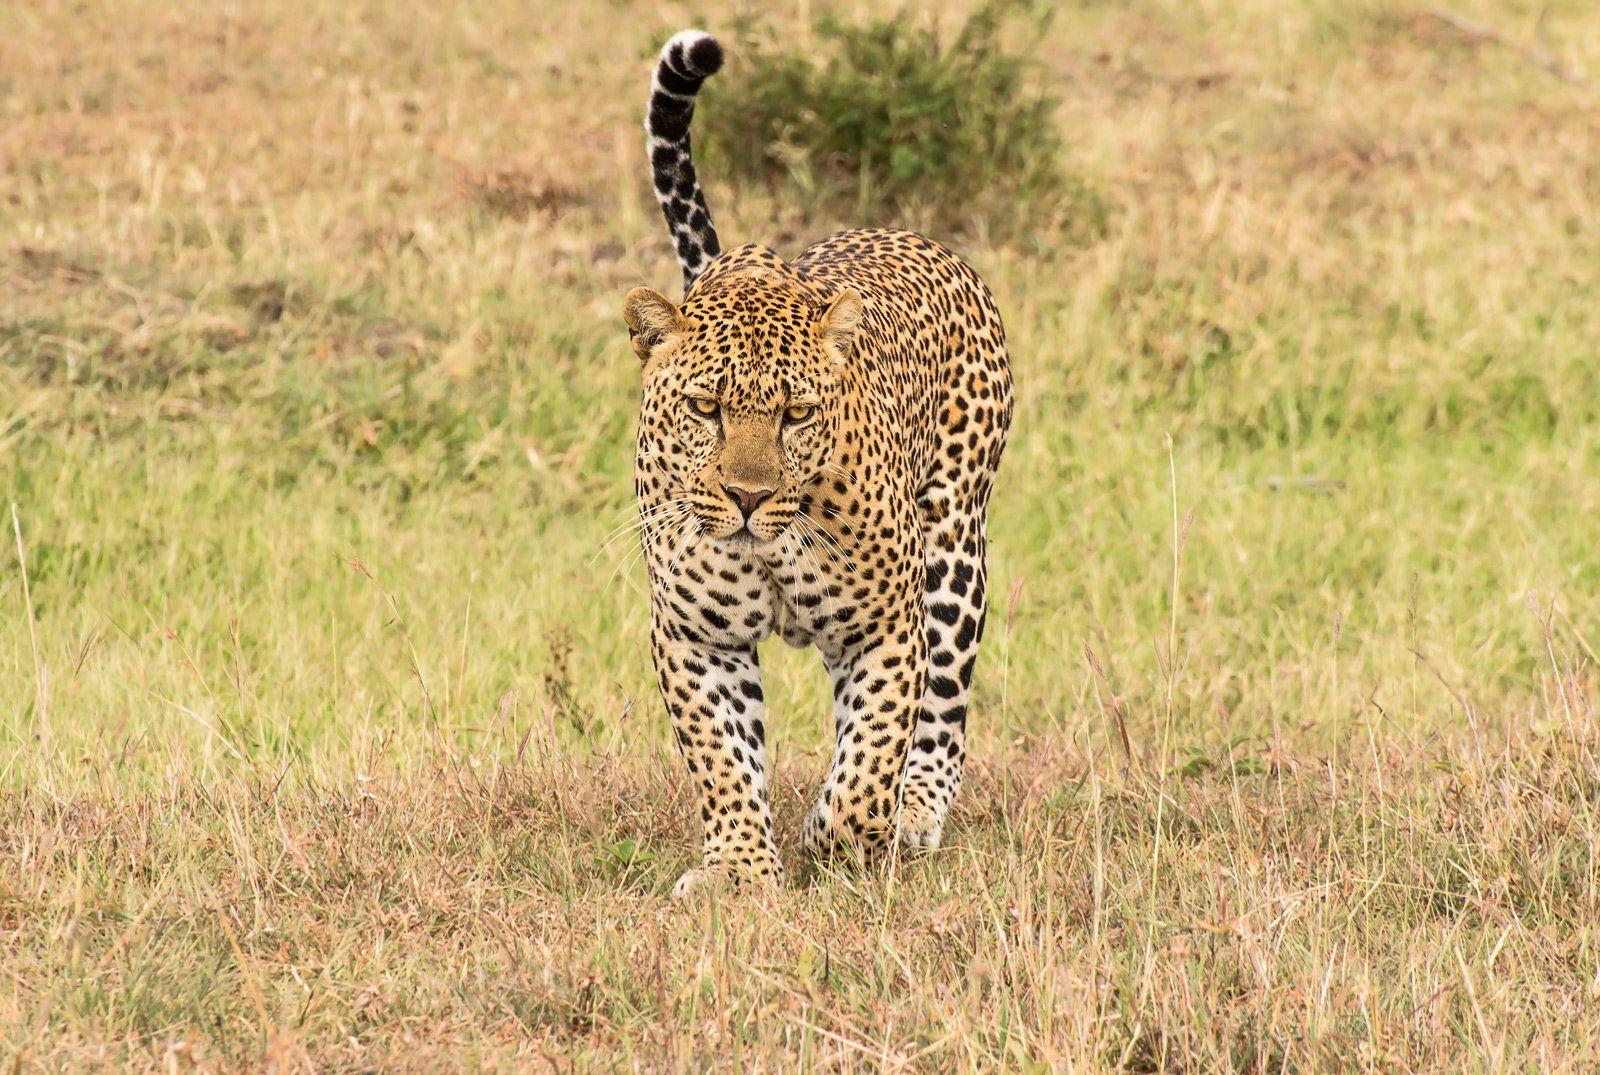 Африка, Африкакения, Дикая природа, Кошки, Леопард, Михаил Туркеев